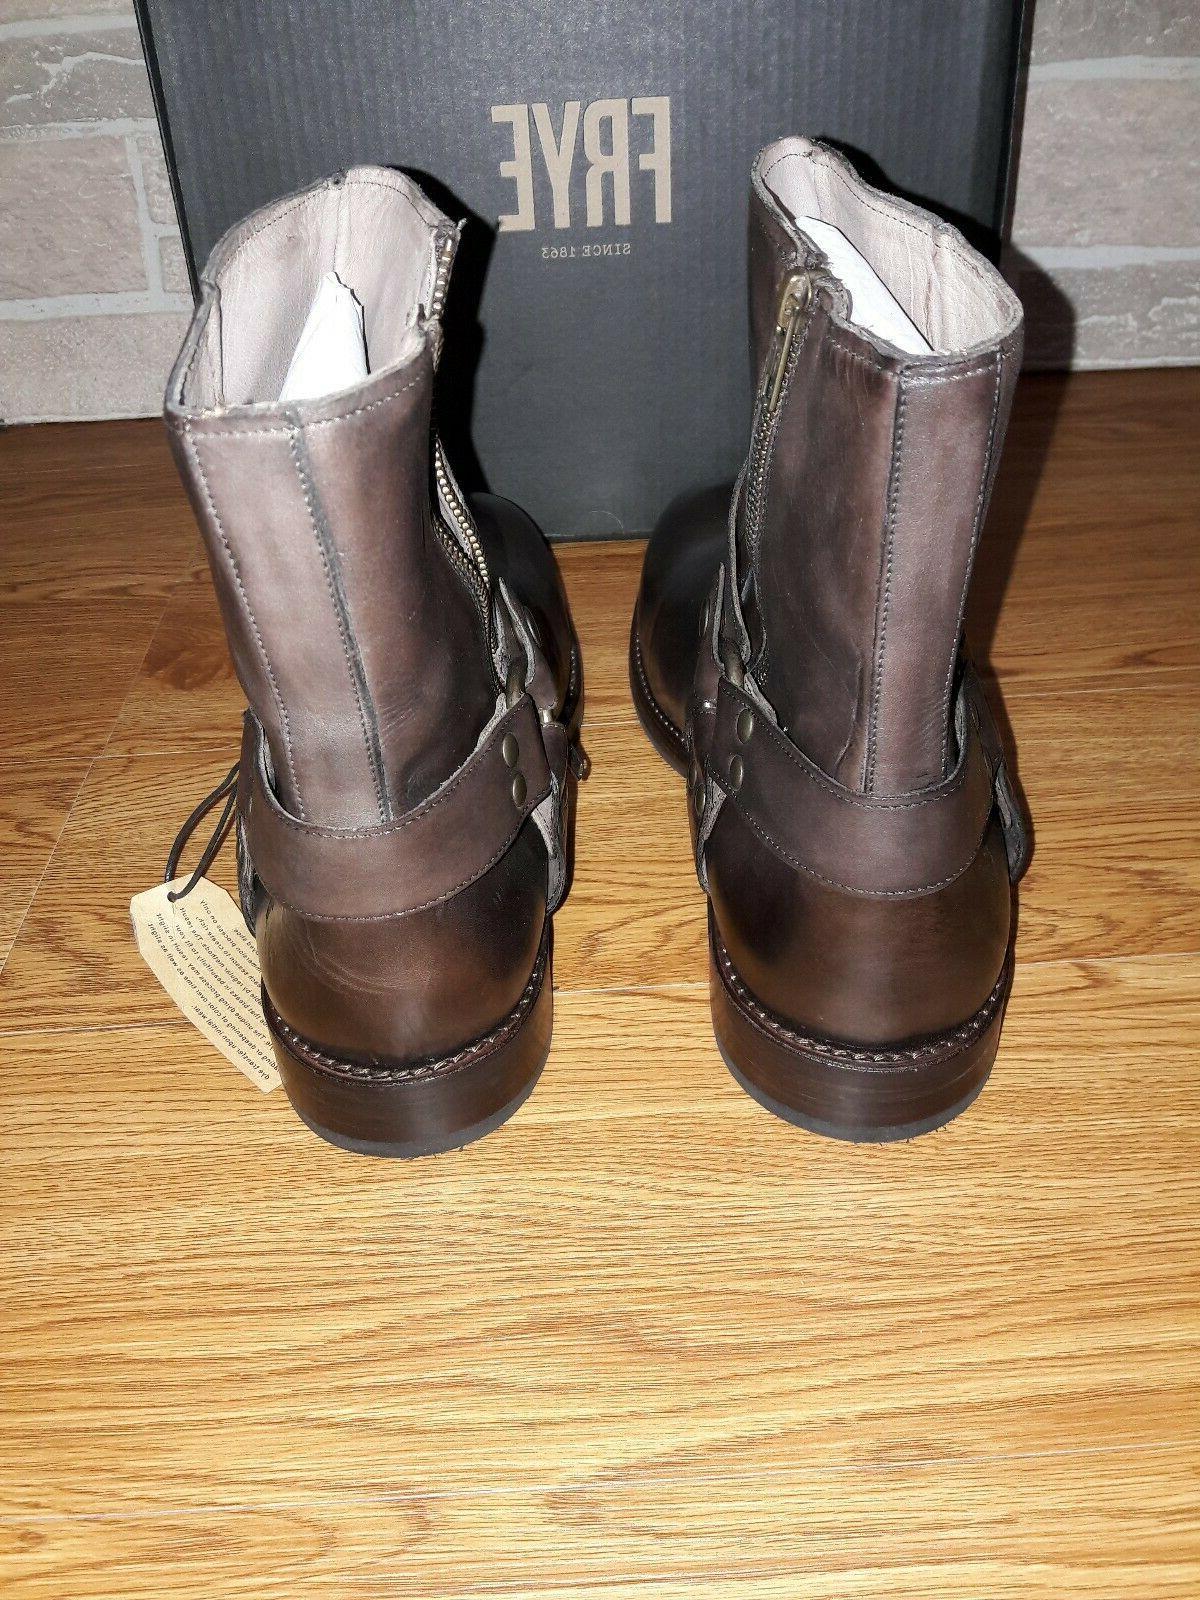 New Harness Boots Dark 3480275. Size